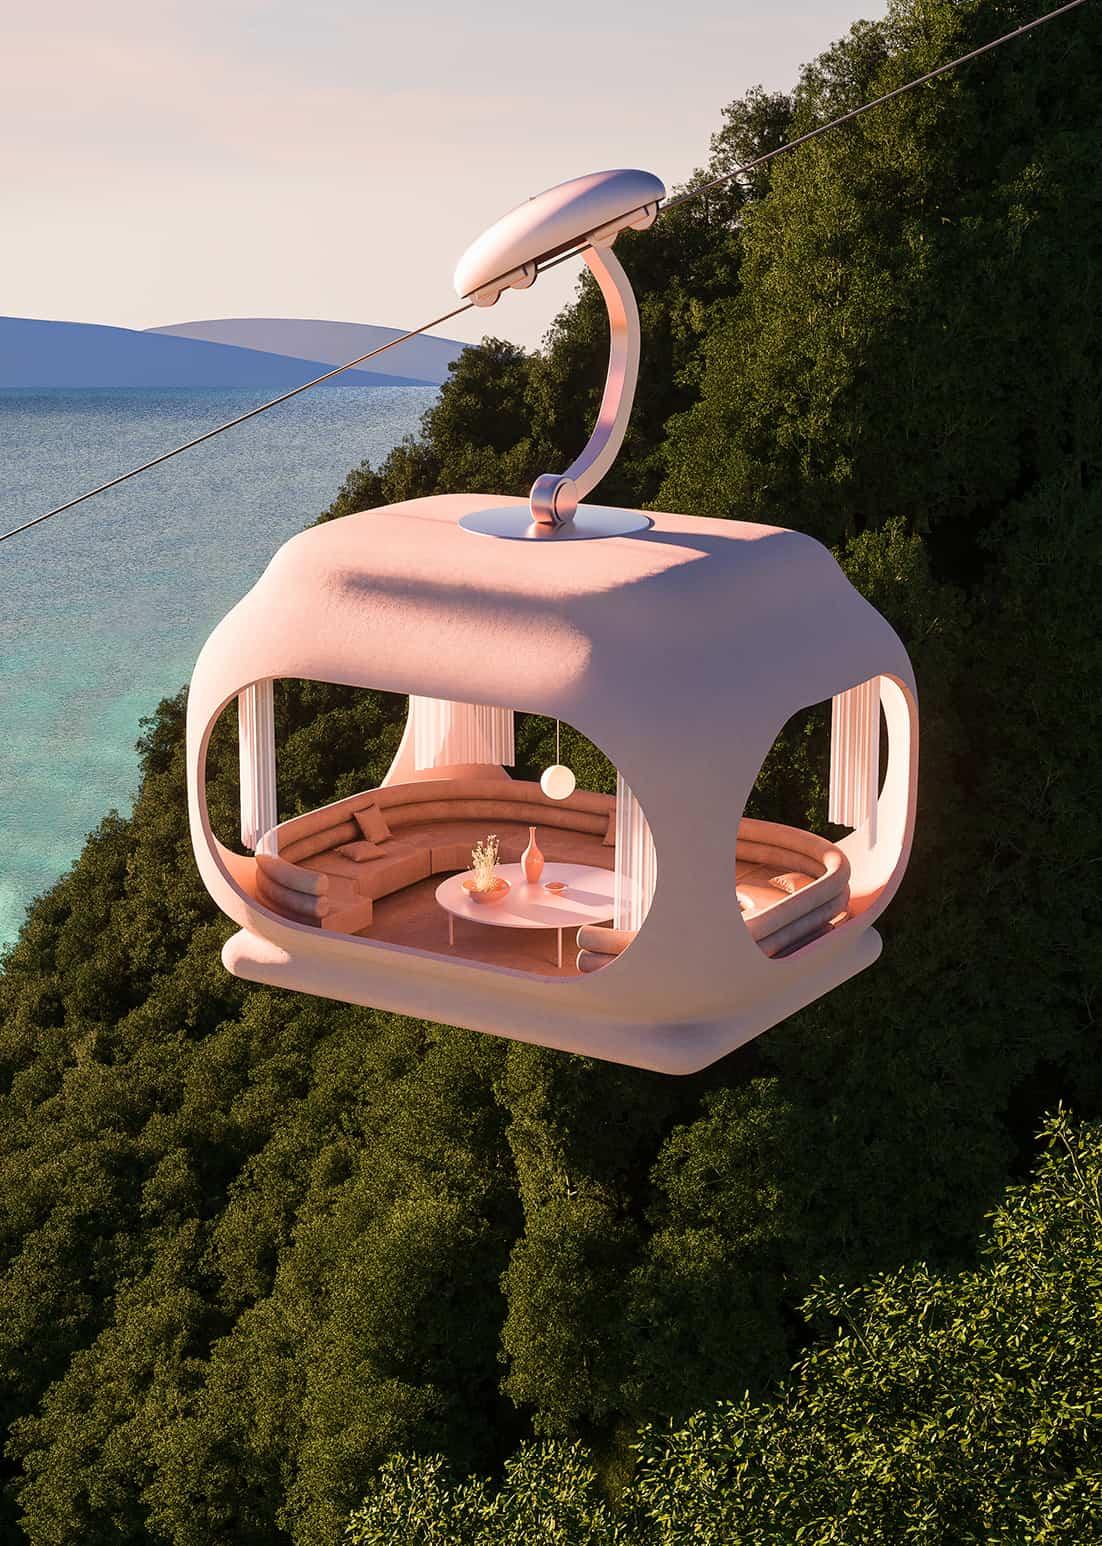 Loftgarten The Resort by Paul Milinski